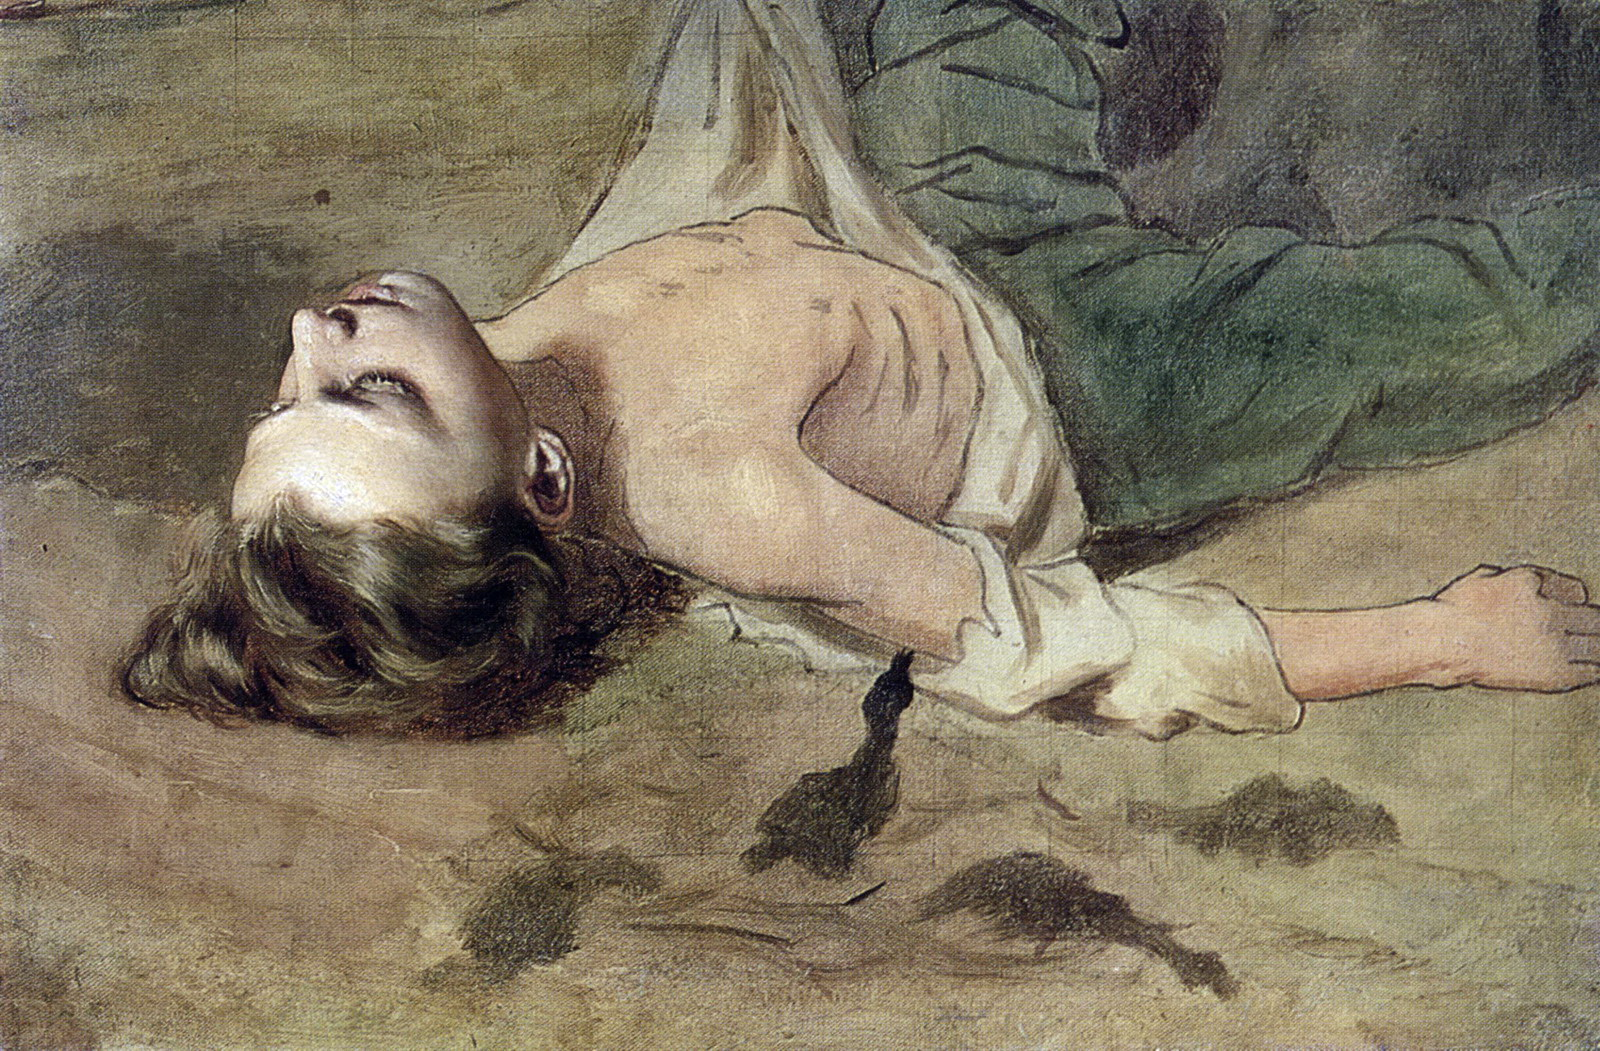 Этюд лежащего мальчика к картине 'Суд Пугачева'. Нач. 1880-х. Х., м. 47х71,5. Пенза